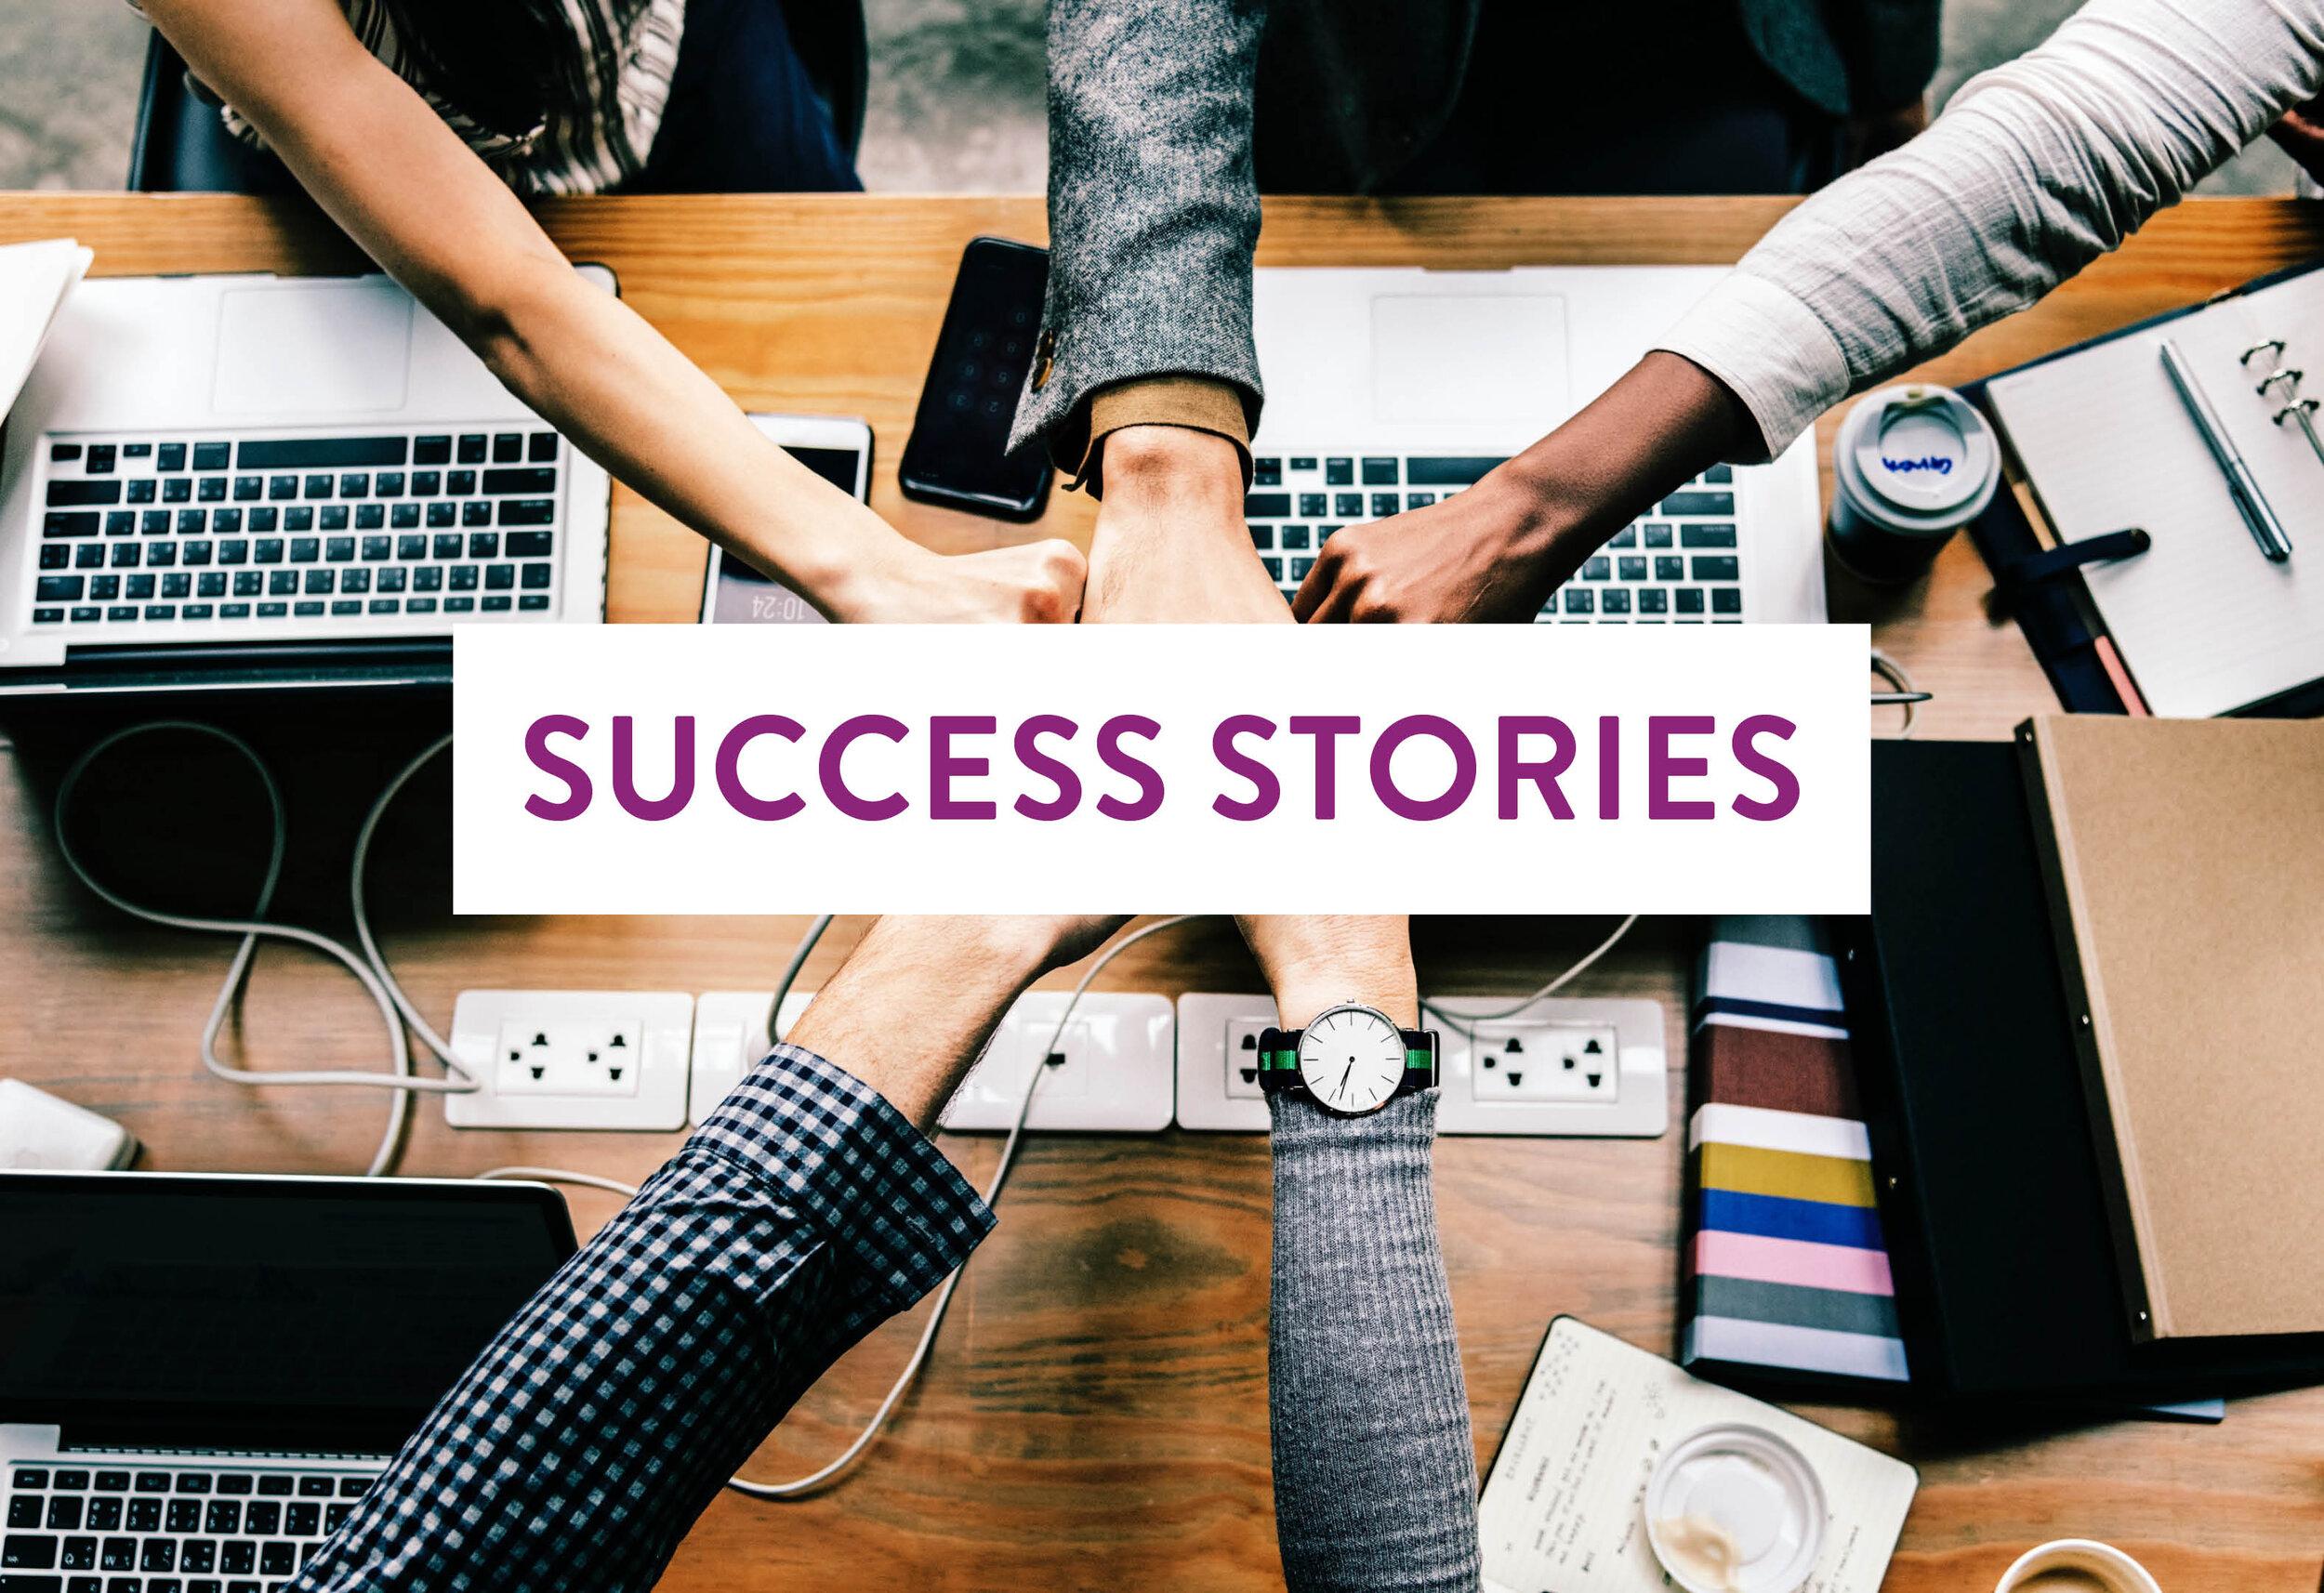 EMPLOYMENT SUCCESS STORIES